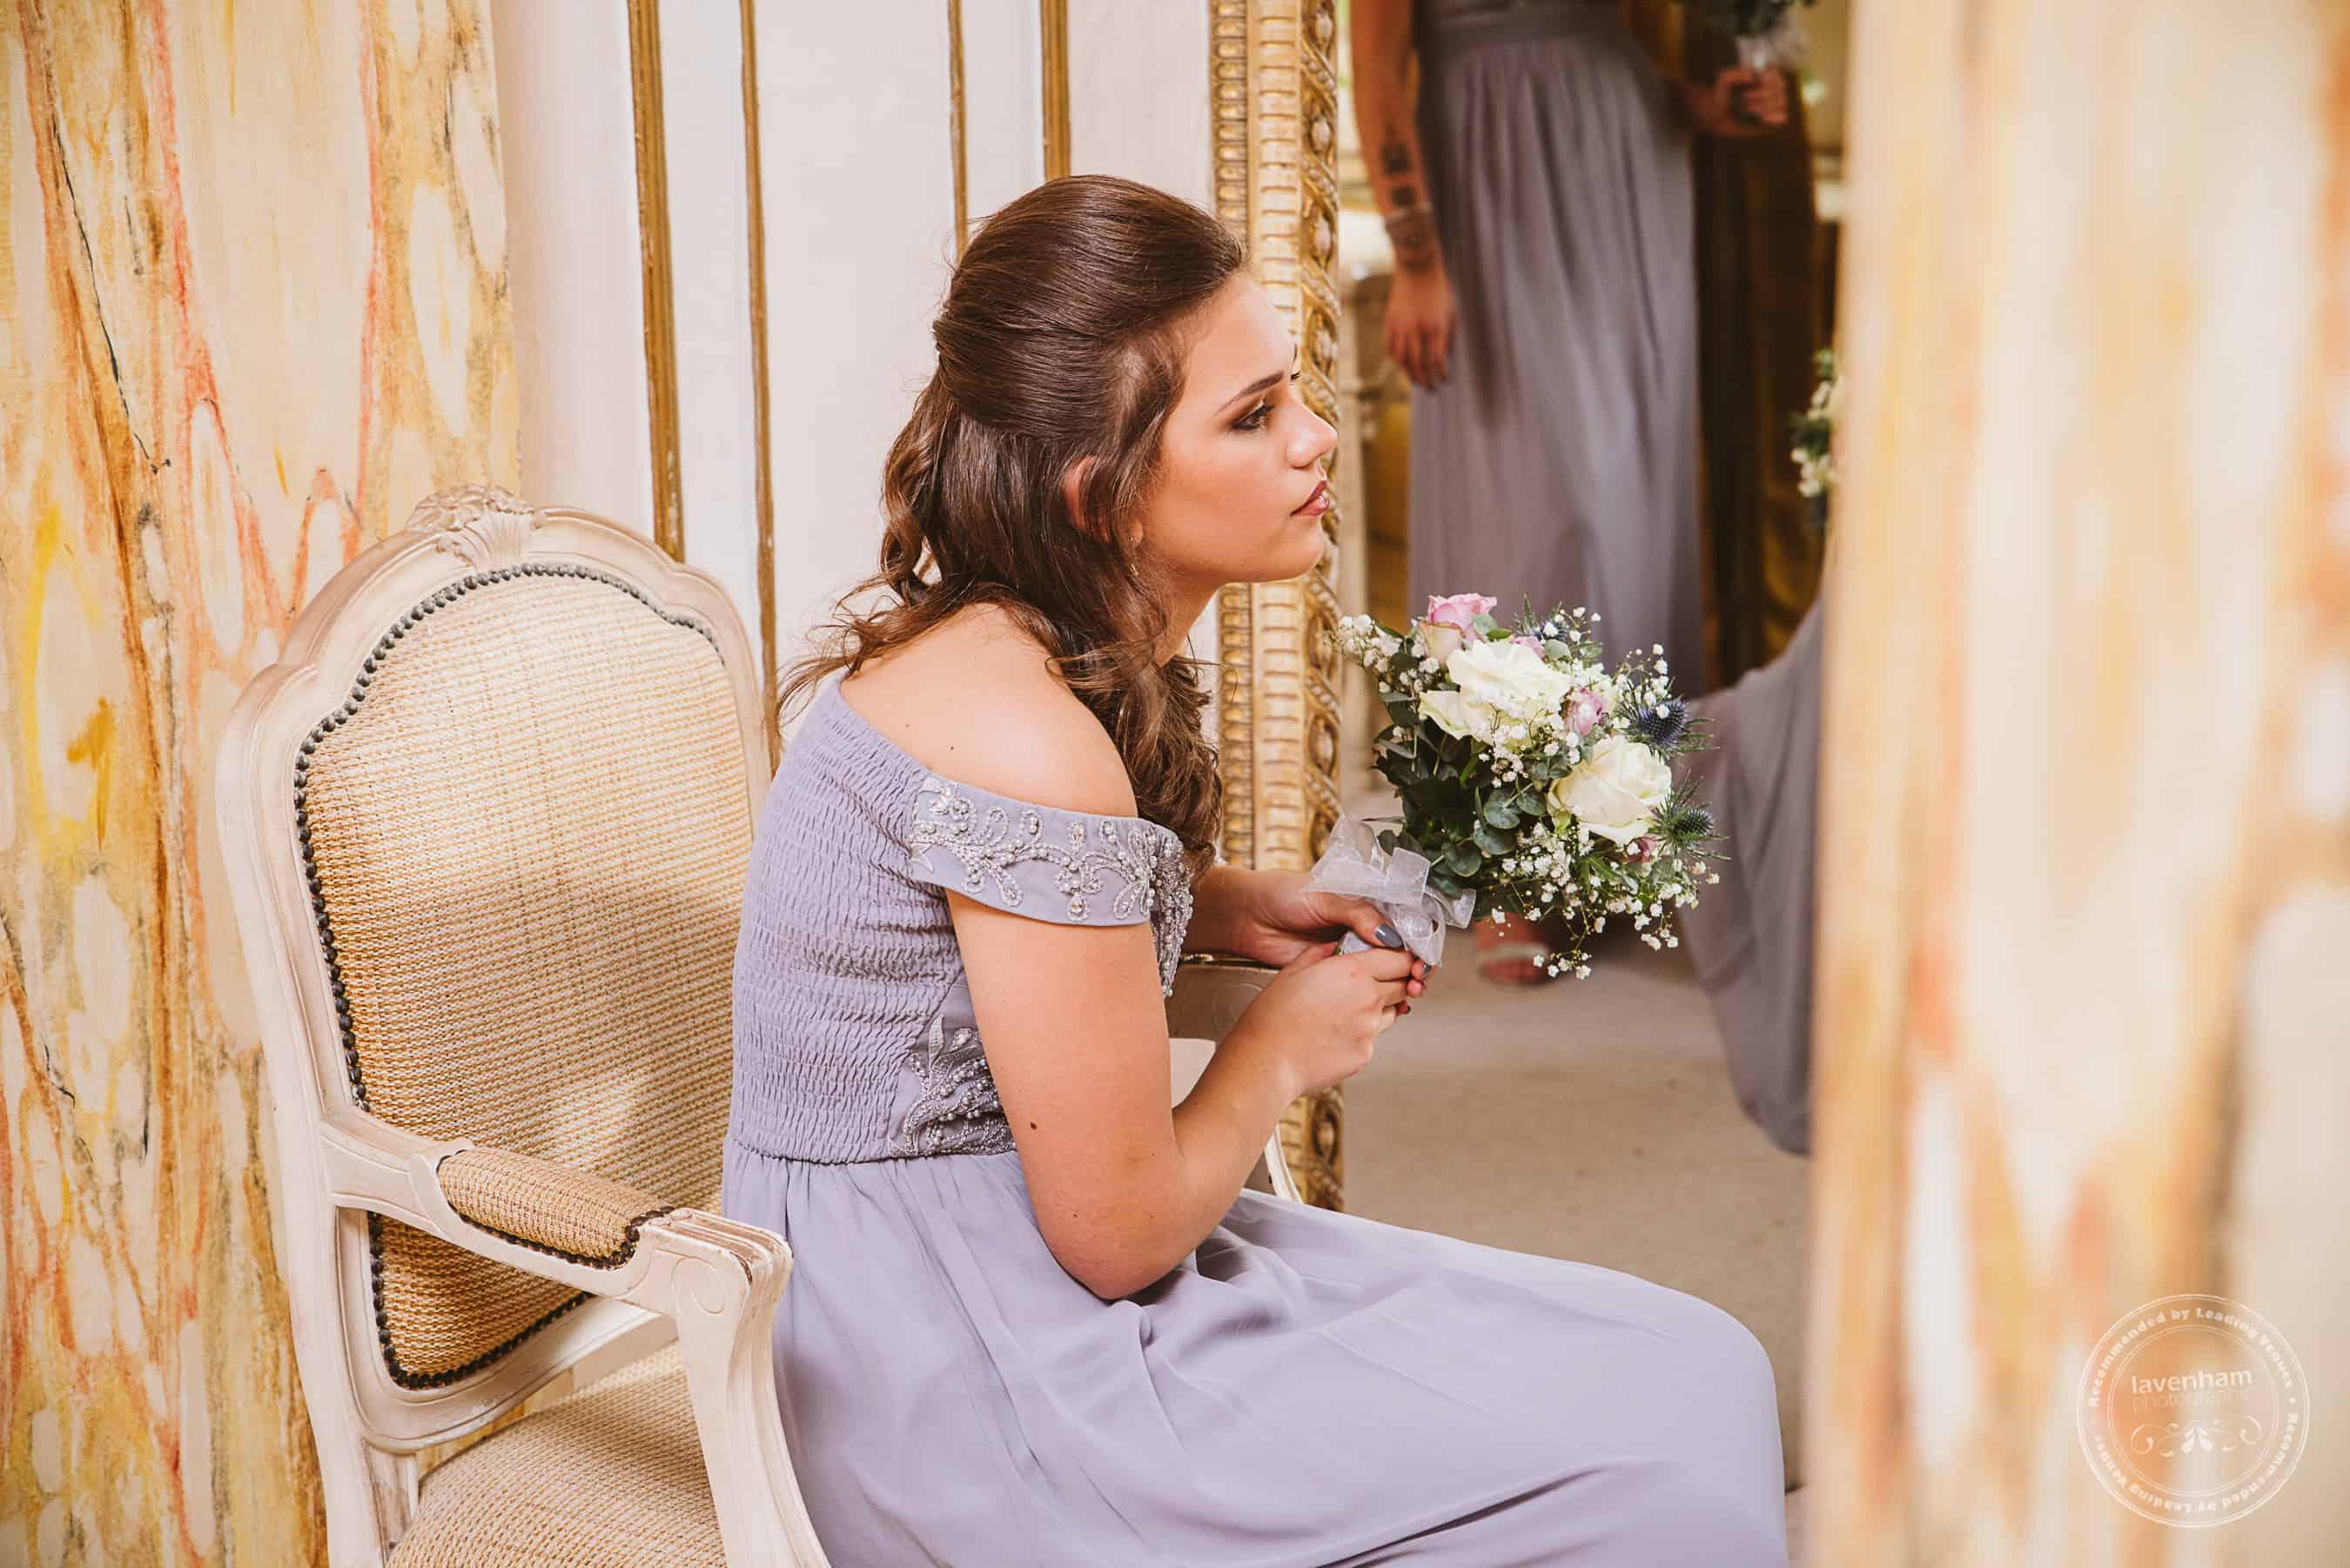 281018 Gosfield Hall Wedding Photography Lavenham Photographic 044